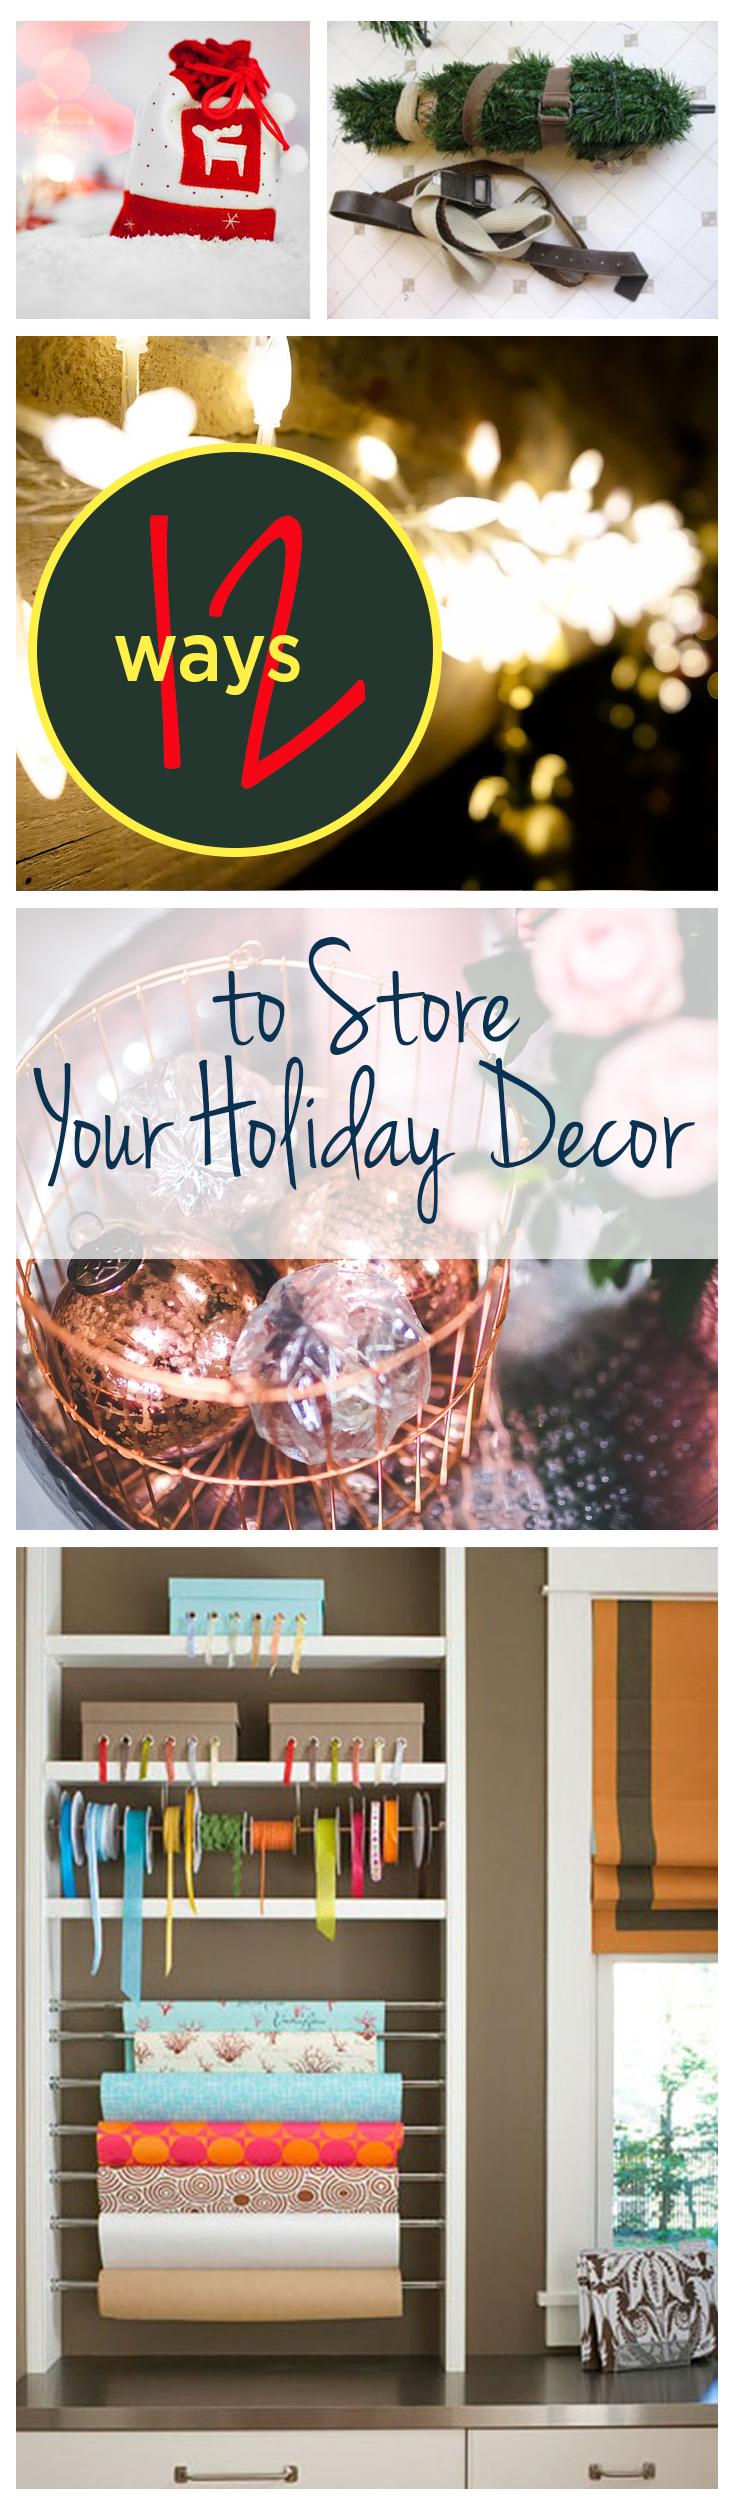 Christmas decorations, DIY christmas decor, popular pin, Christmas deocrations, DIY holiday, holiday decorations